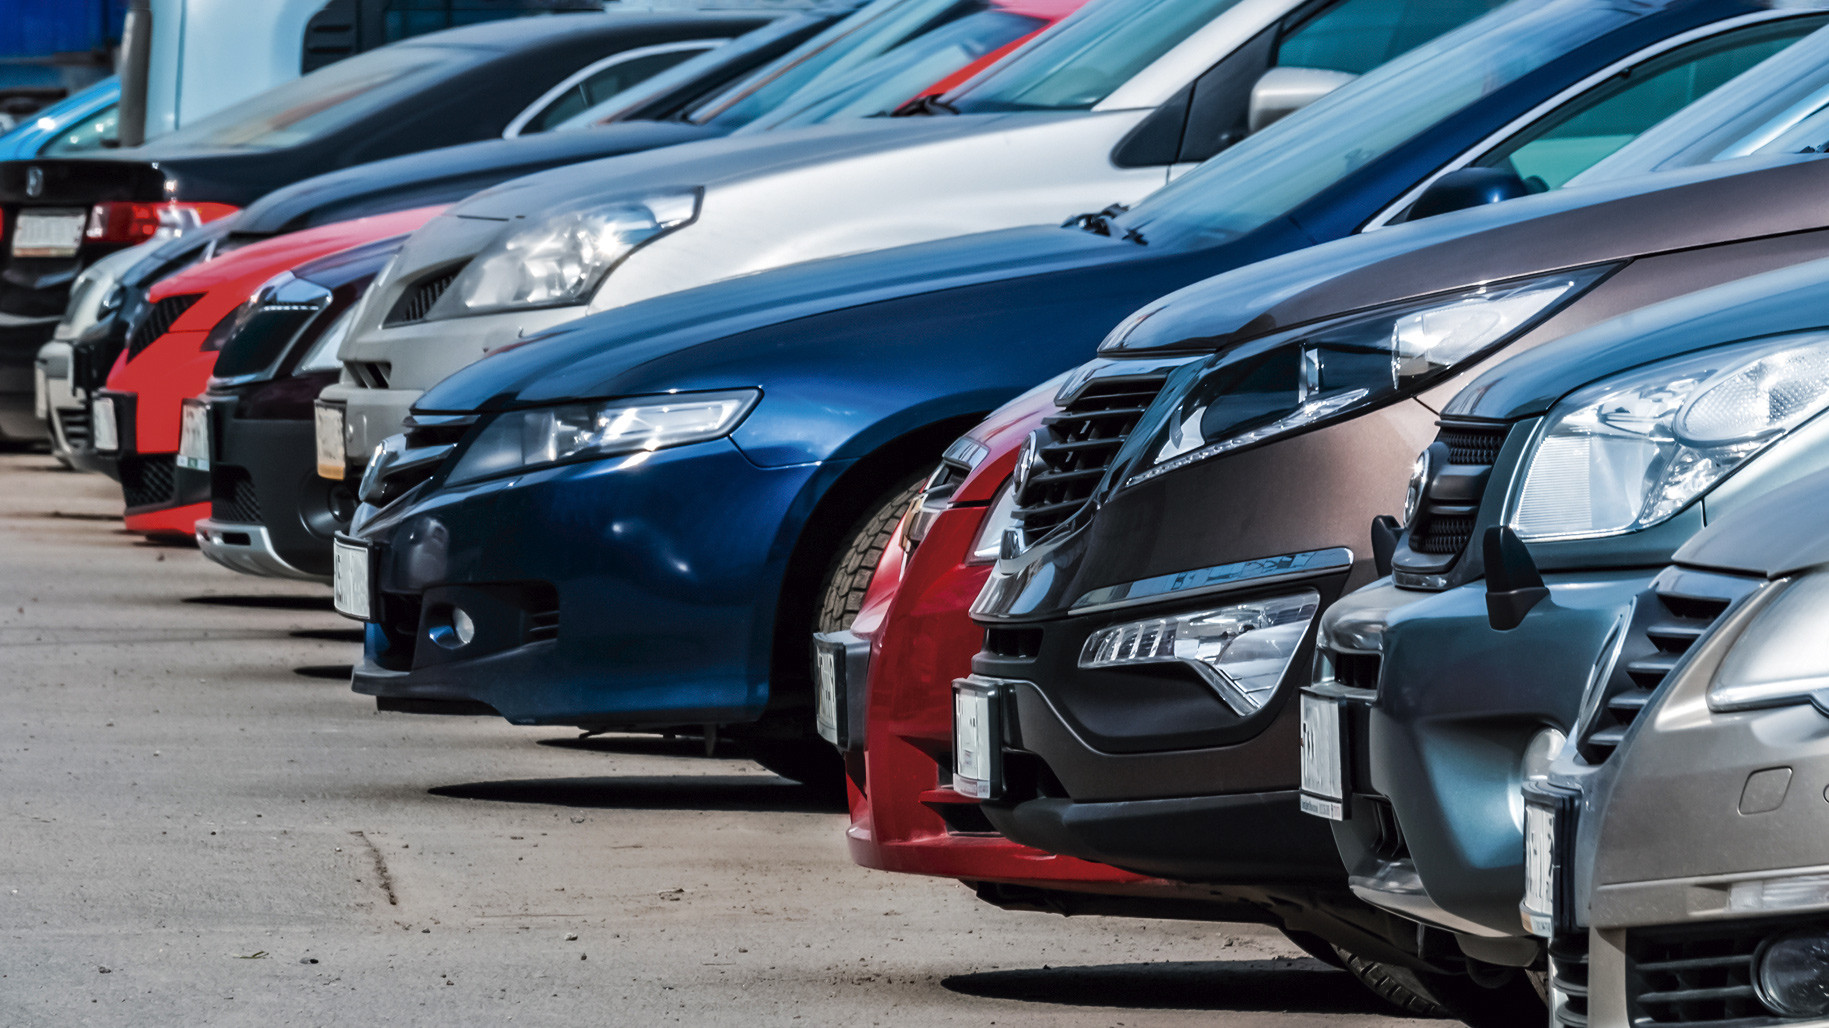 Mercado de autos continuará recuperándose pese a la incertidumbre política